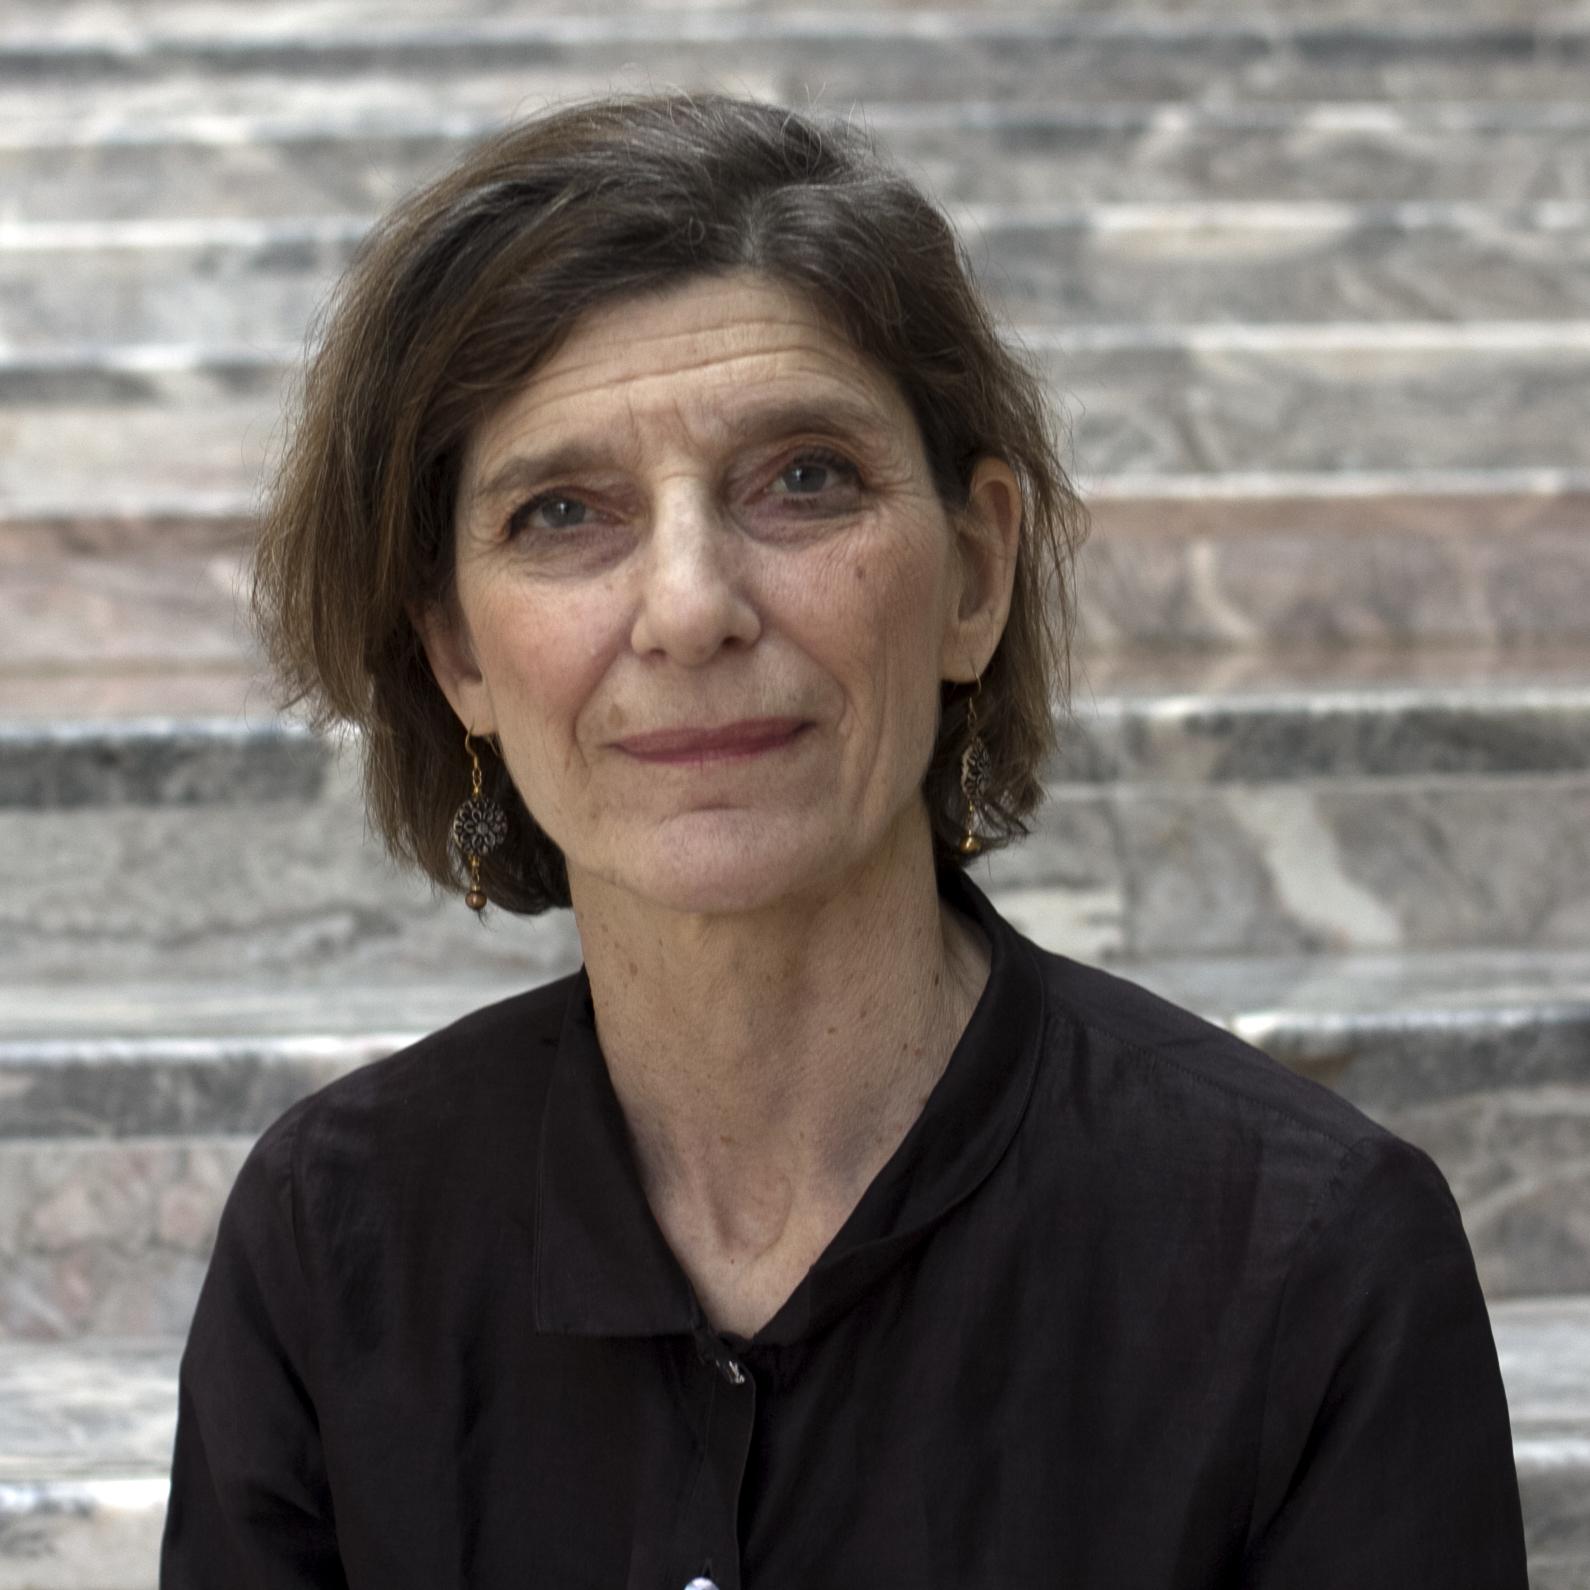 Author Photo - Ann Goldstein (c) E. Tammy Kim - Carla Cain-Walther